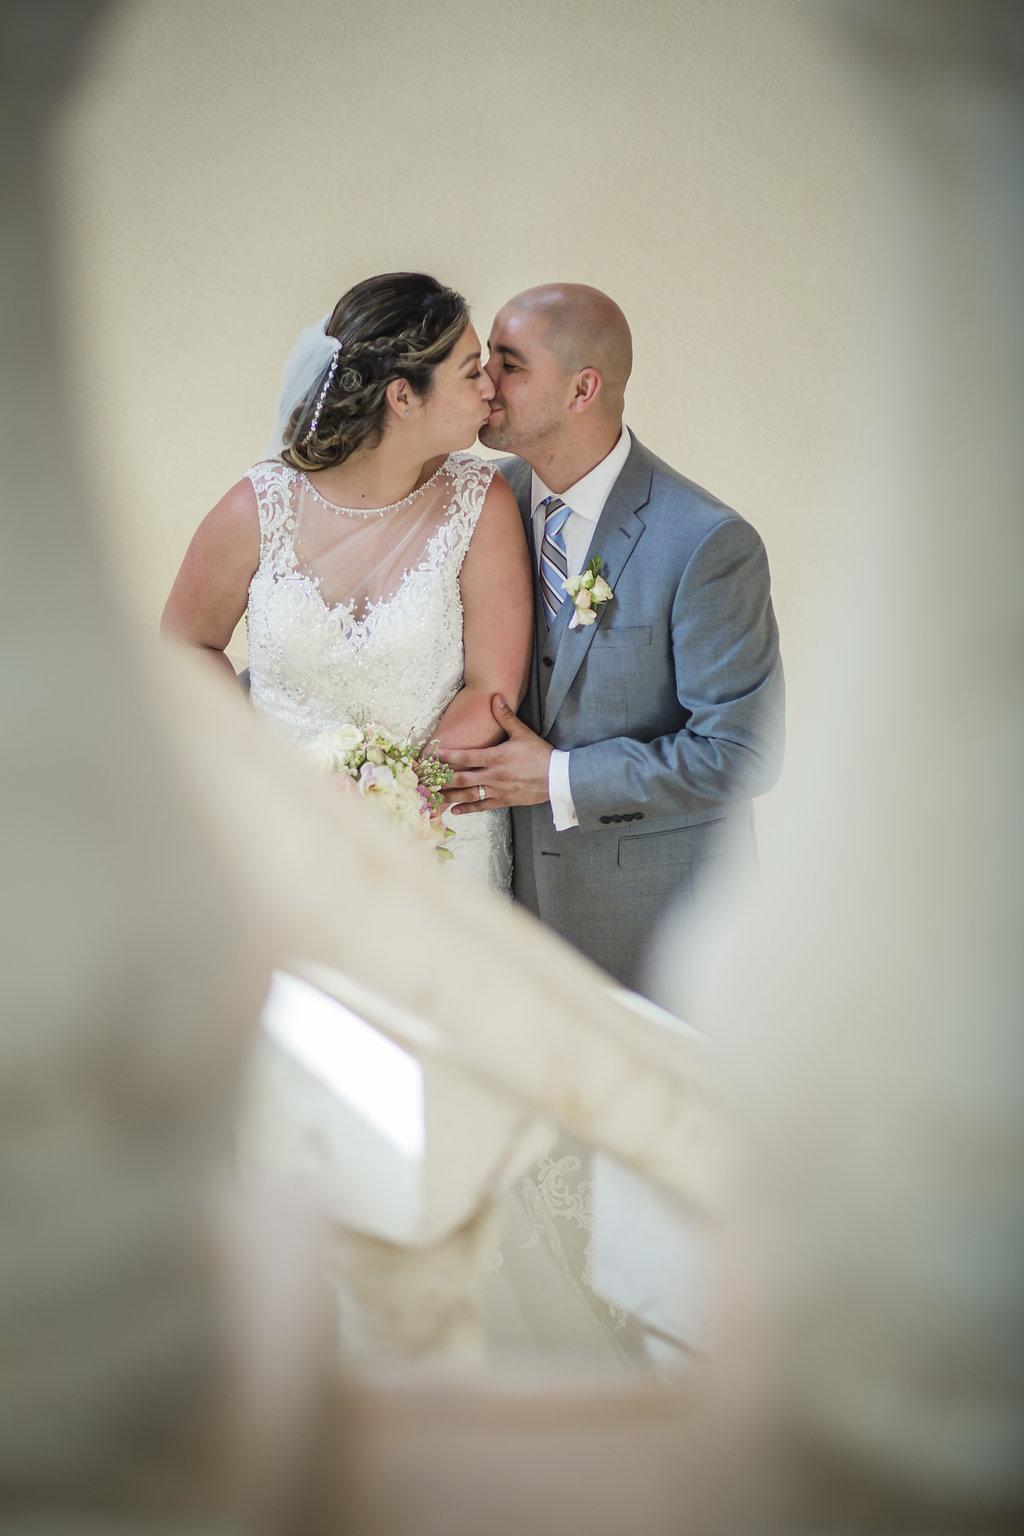 yesica-jose-beach-wedding-Villa-La-Joya--Playa-del-carmen-01--20.jpg